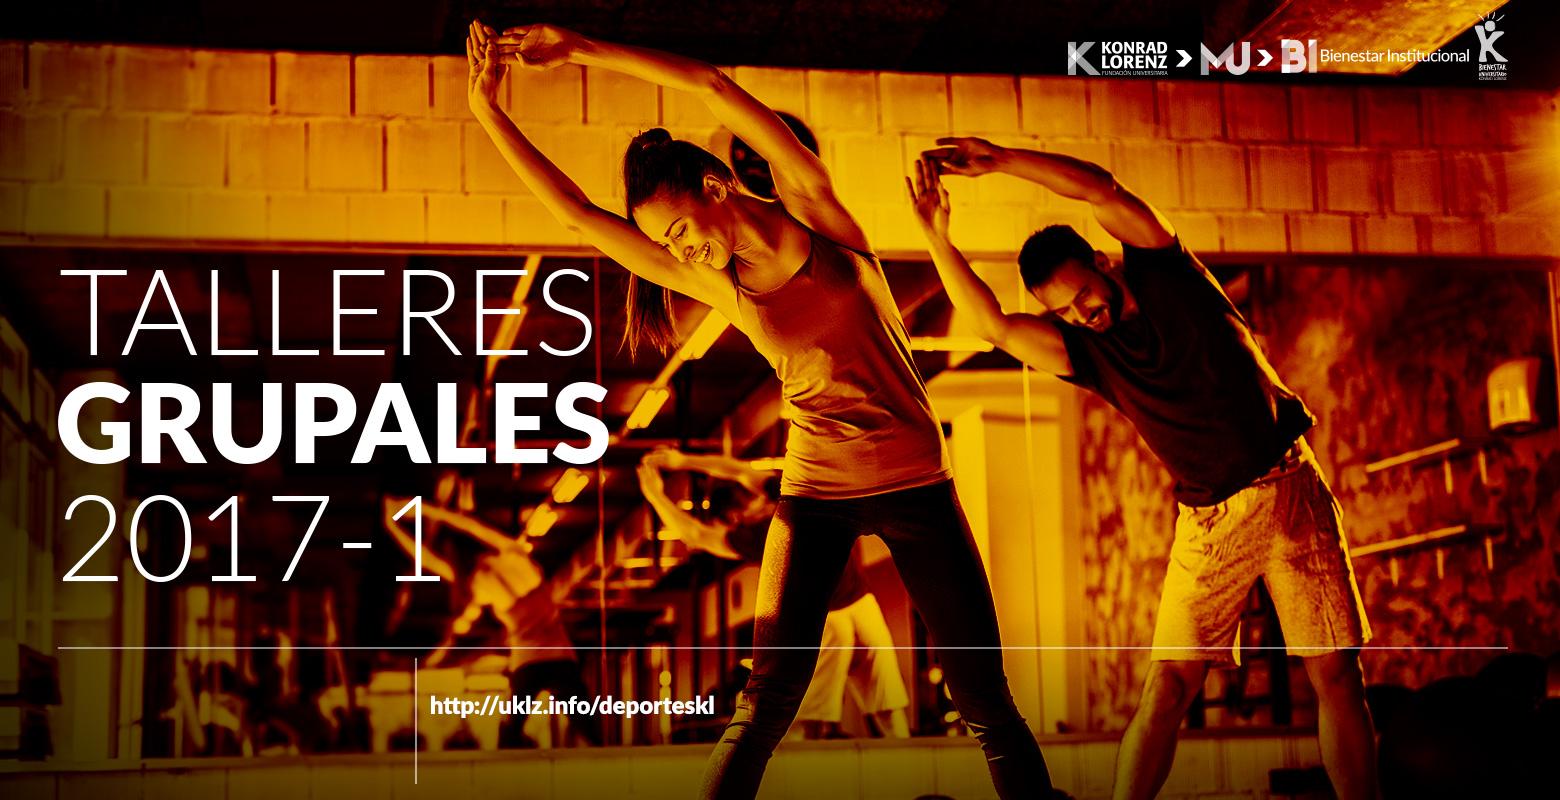 Talleres Grupales 2017-1